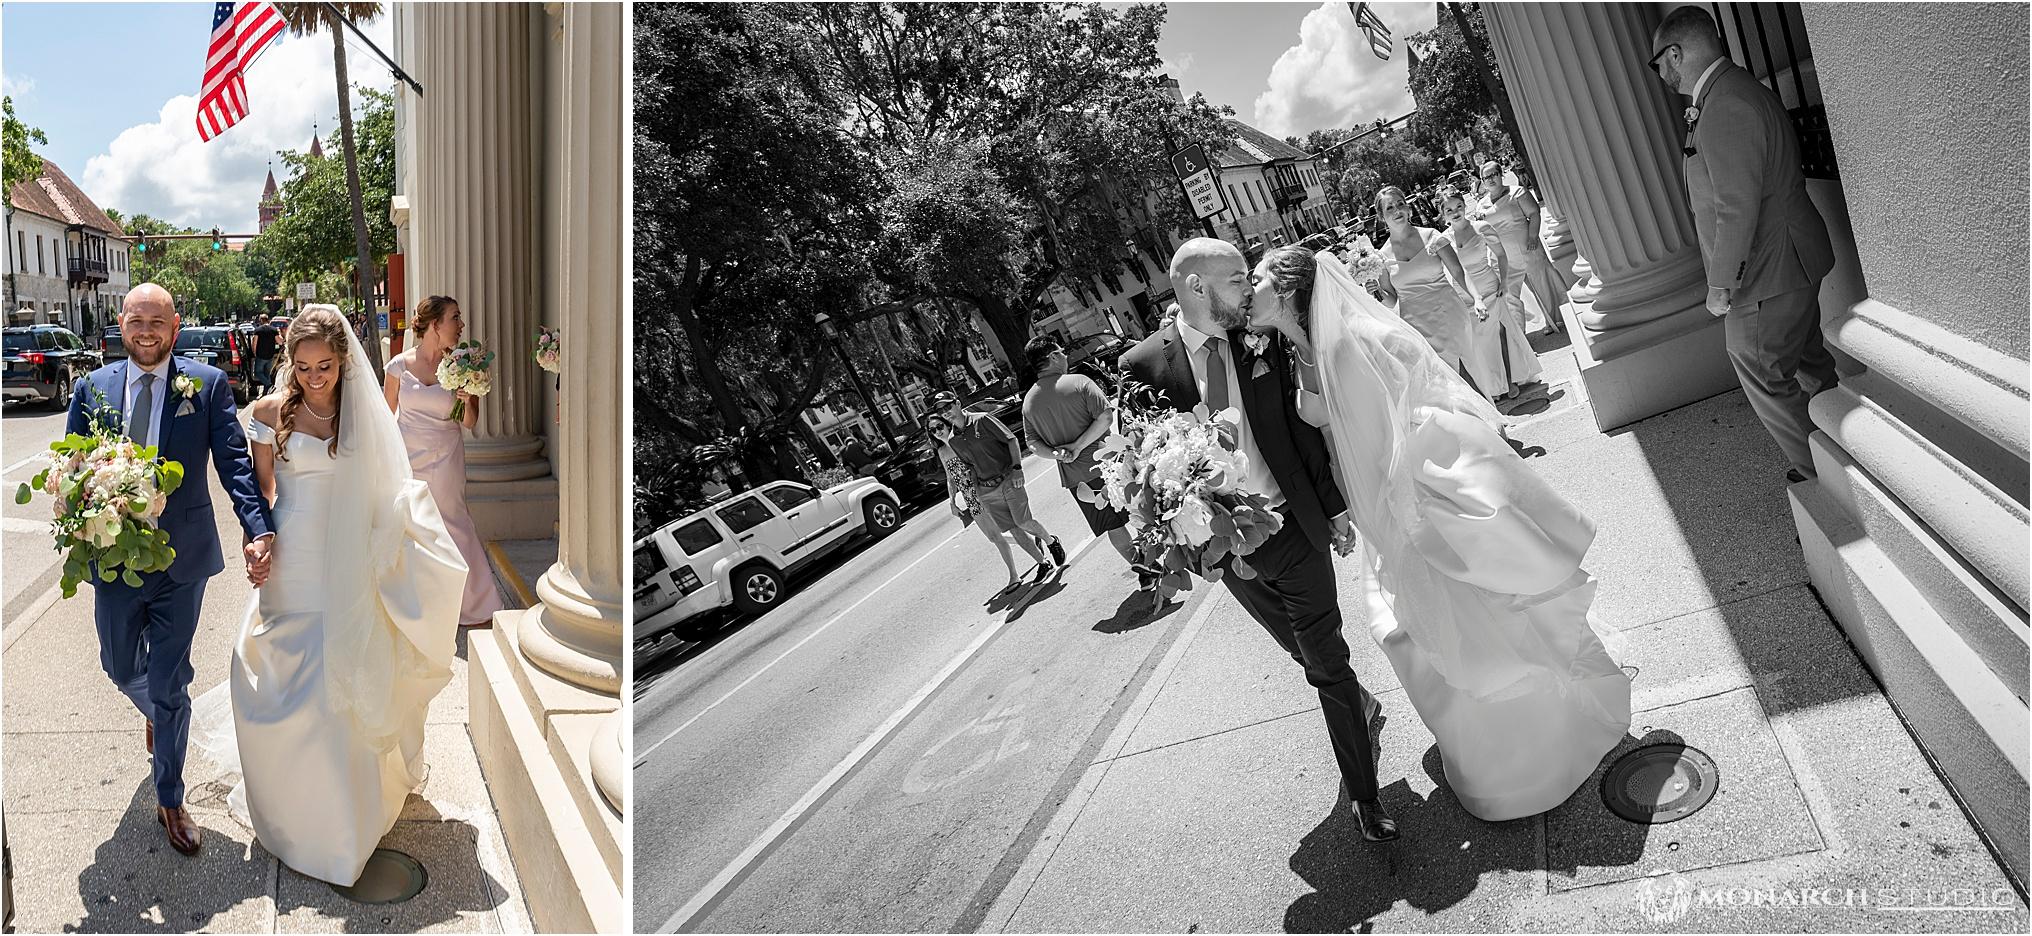 saint-augustine-photographer-Whiteroom-050.jpg